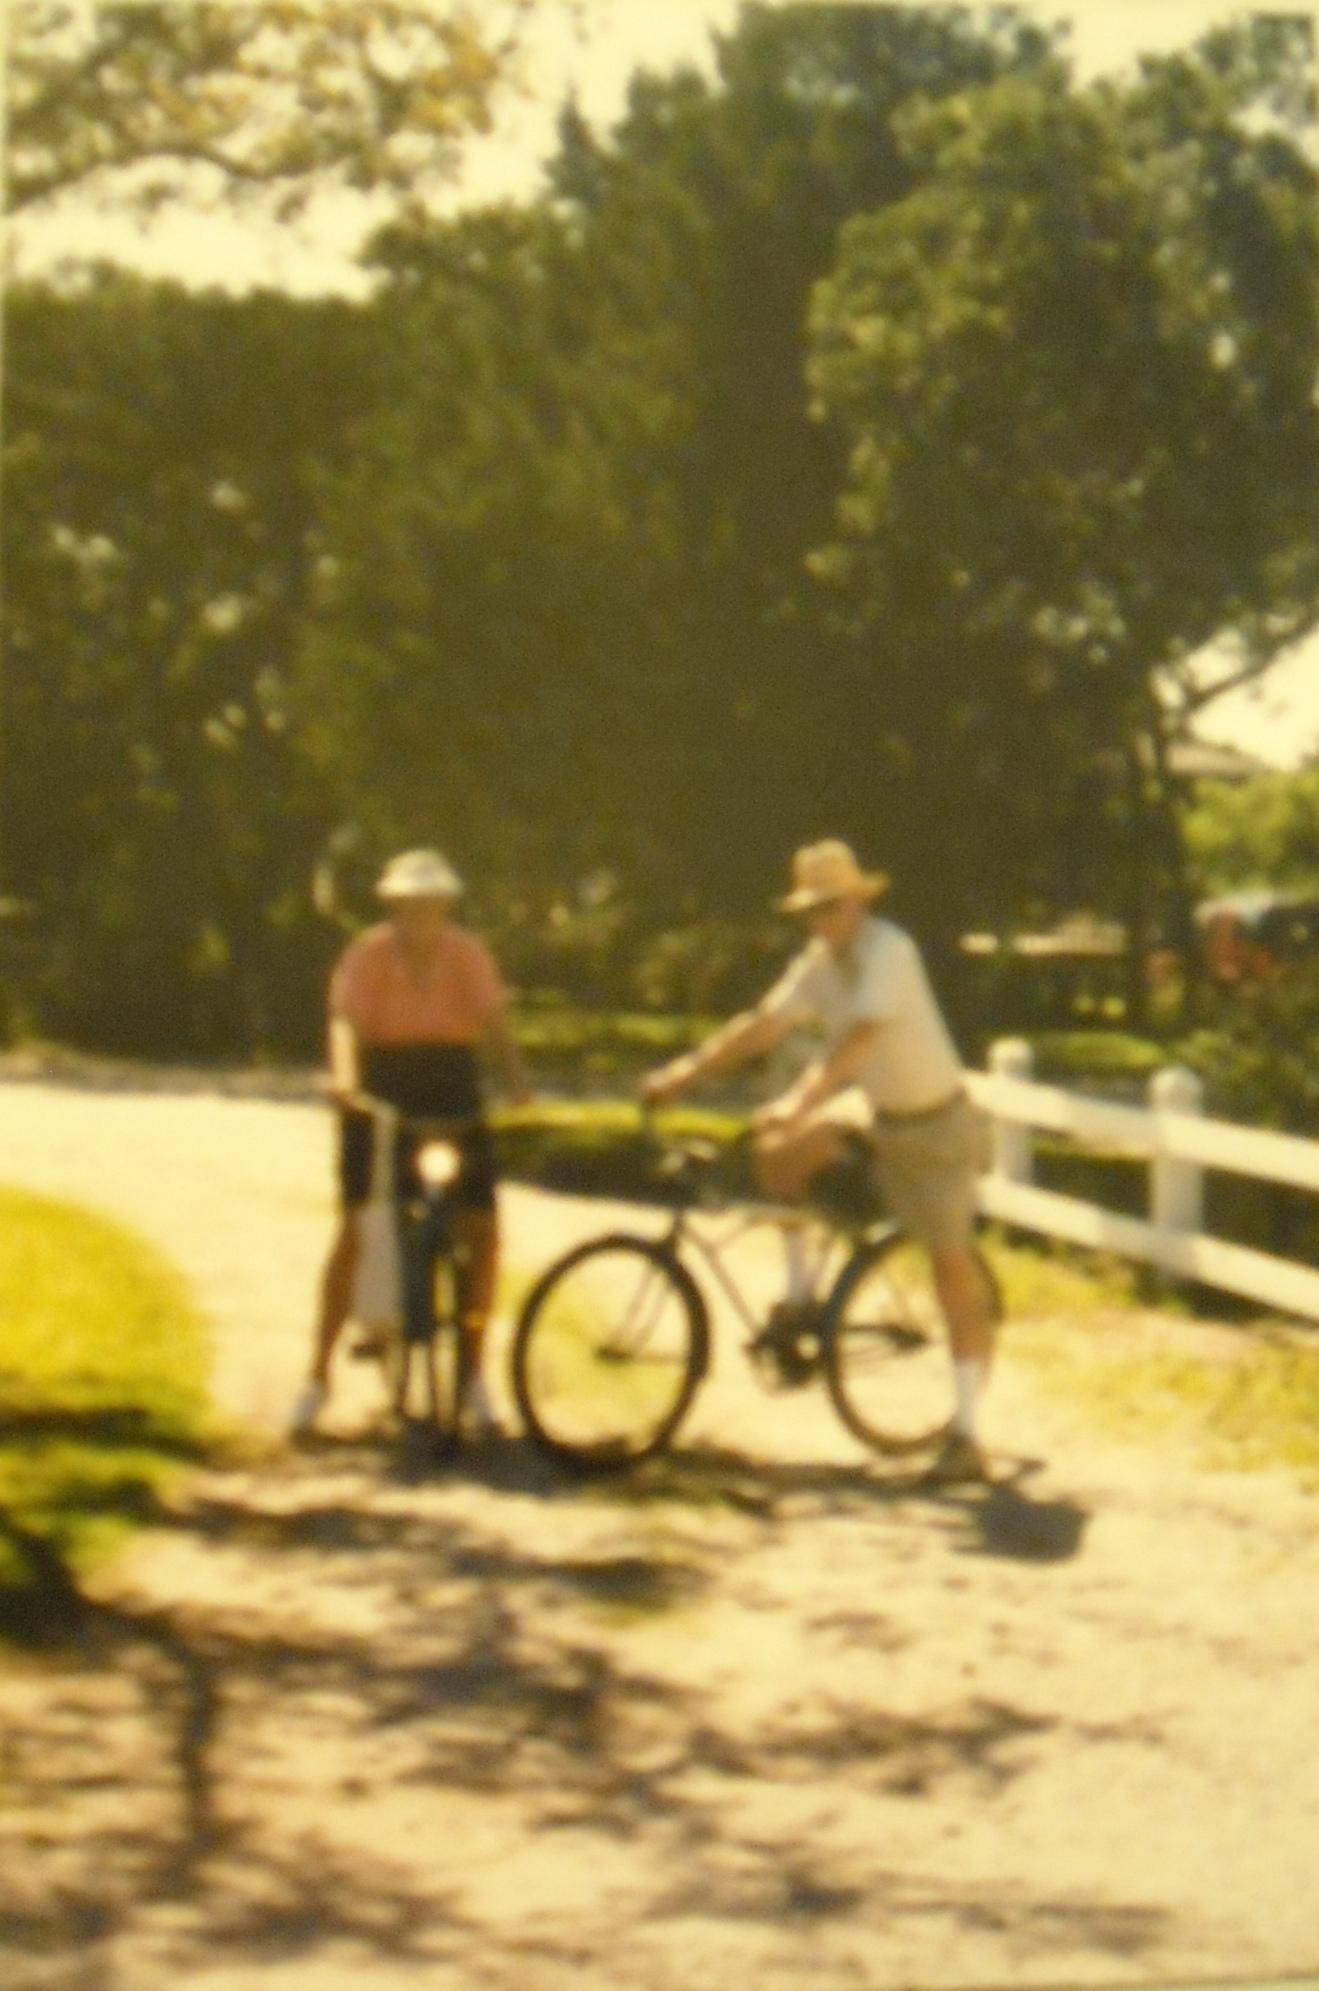 Heymama and Papa on their 50th Wedding Anniversary, Ocracoke Island, NC